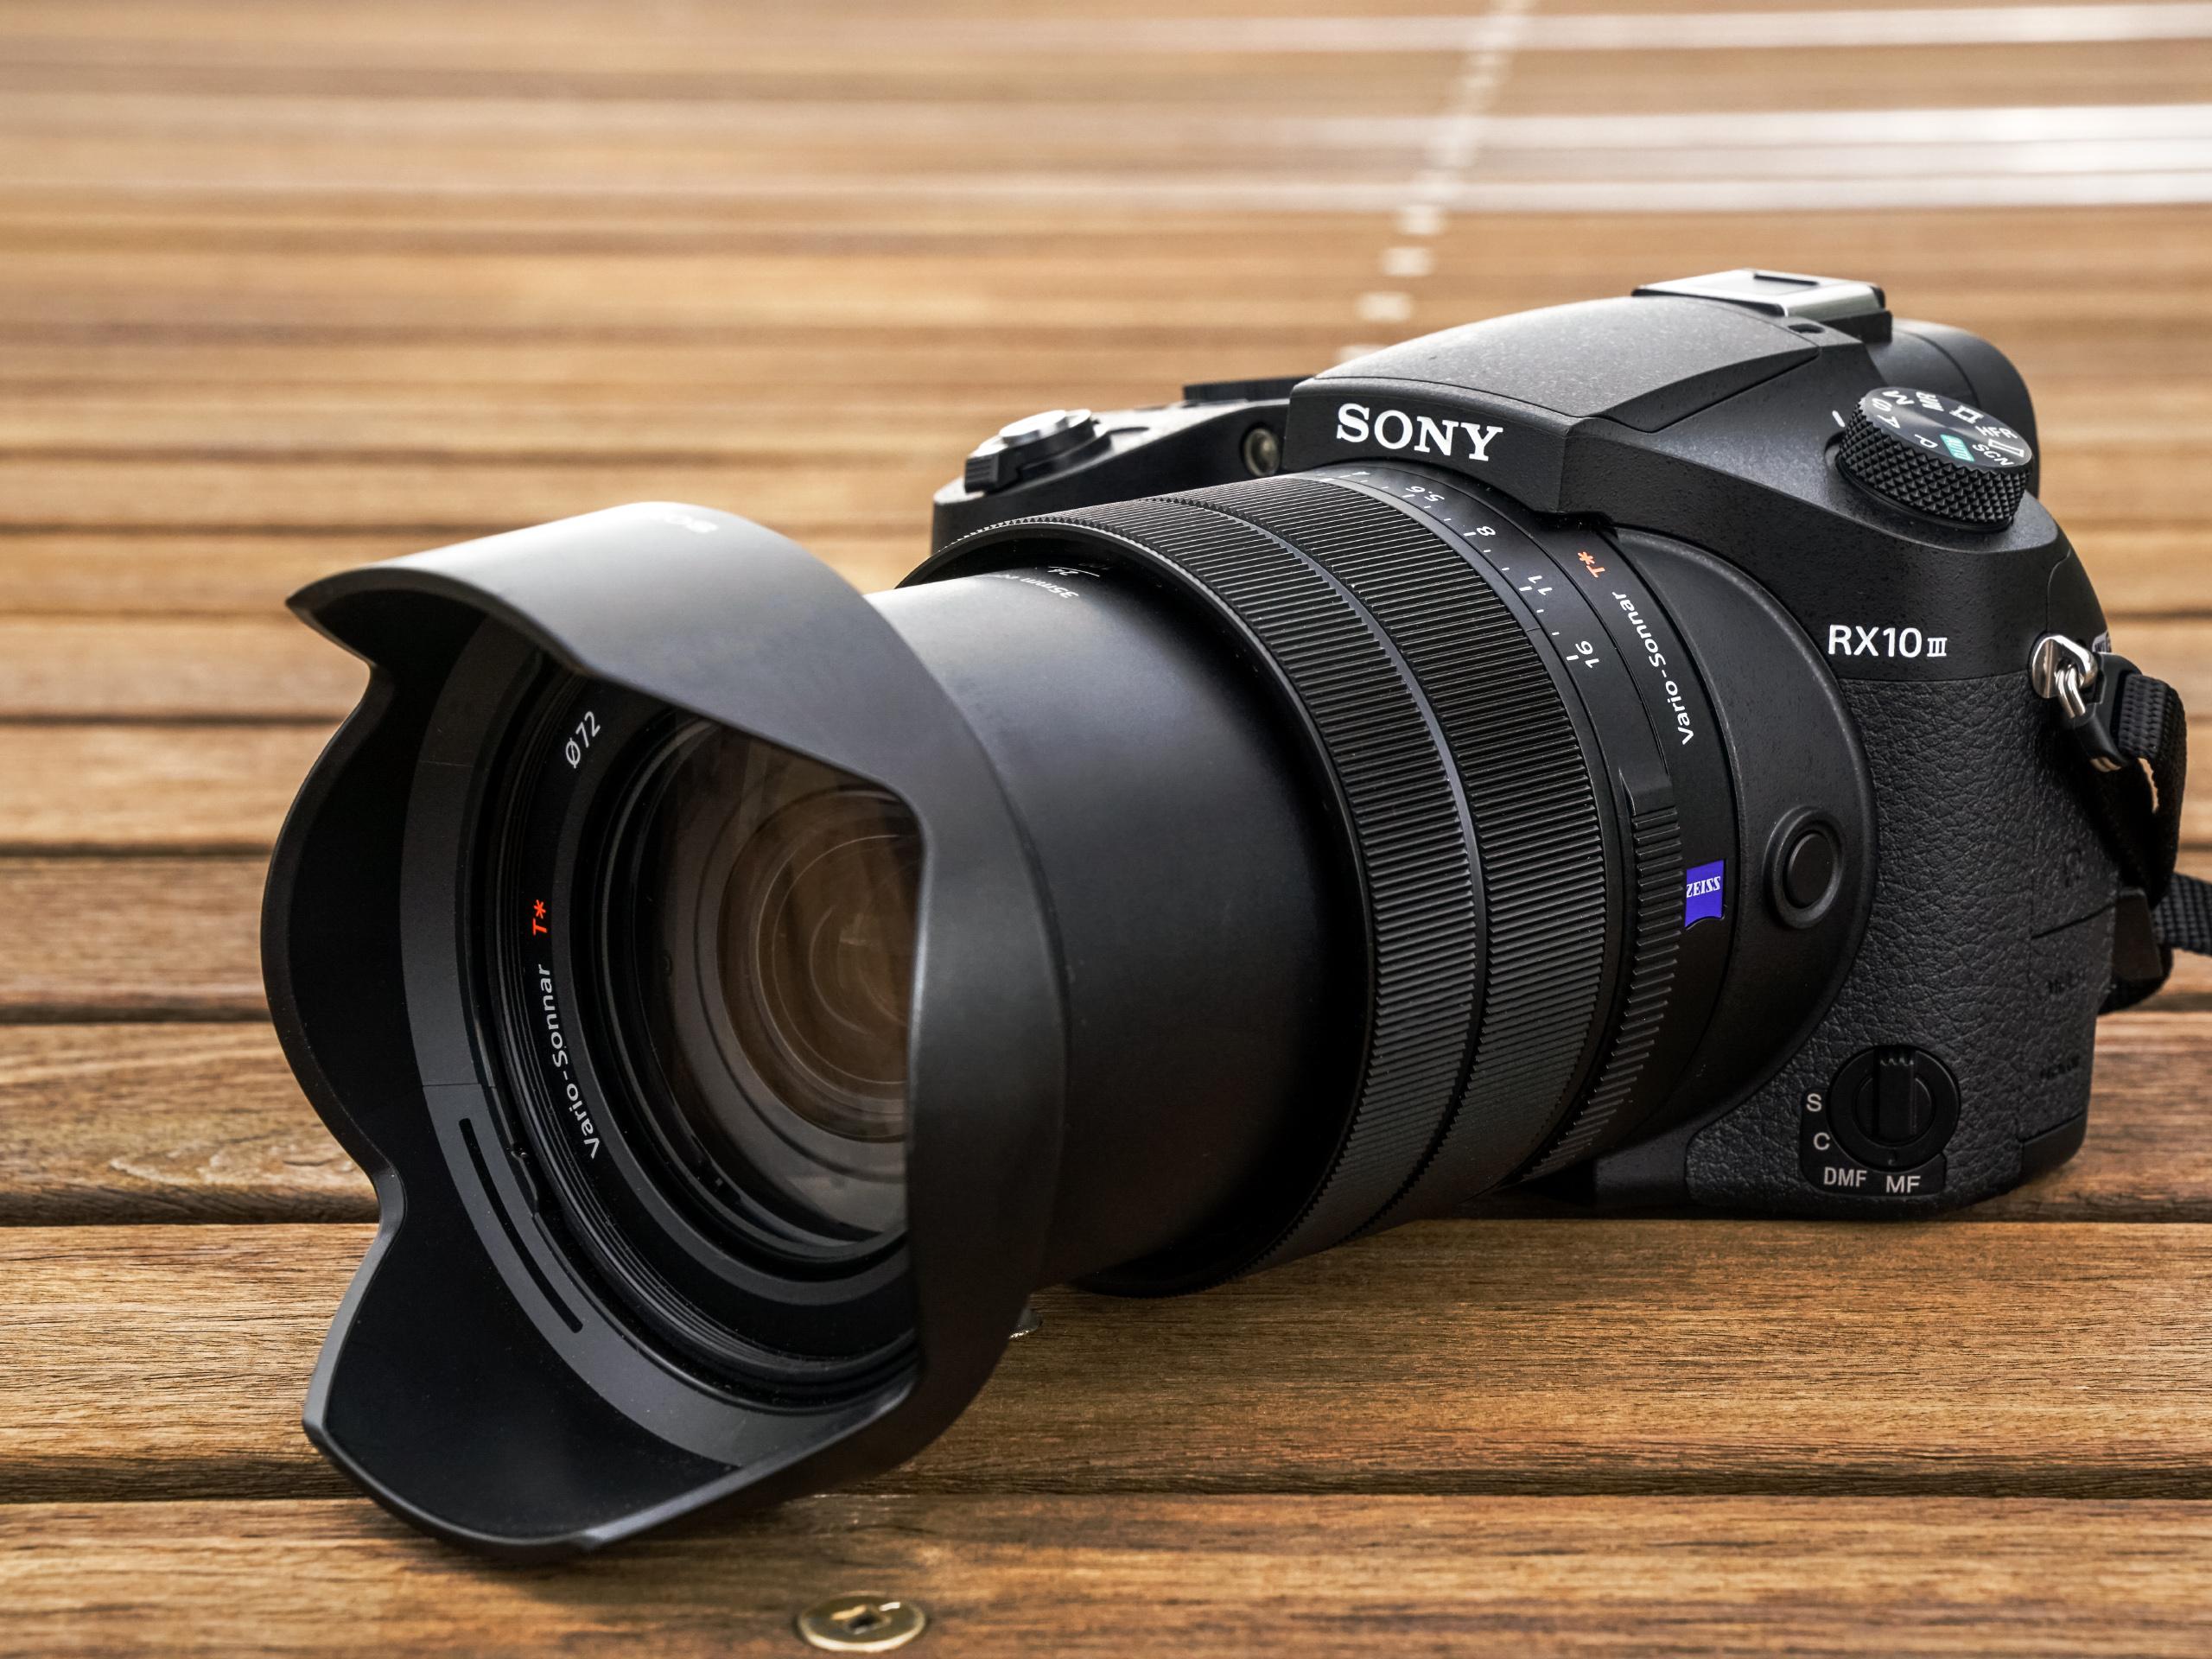 Three's a charm: Sony RX10 III added to studio scene comparison tool